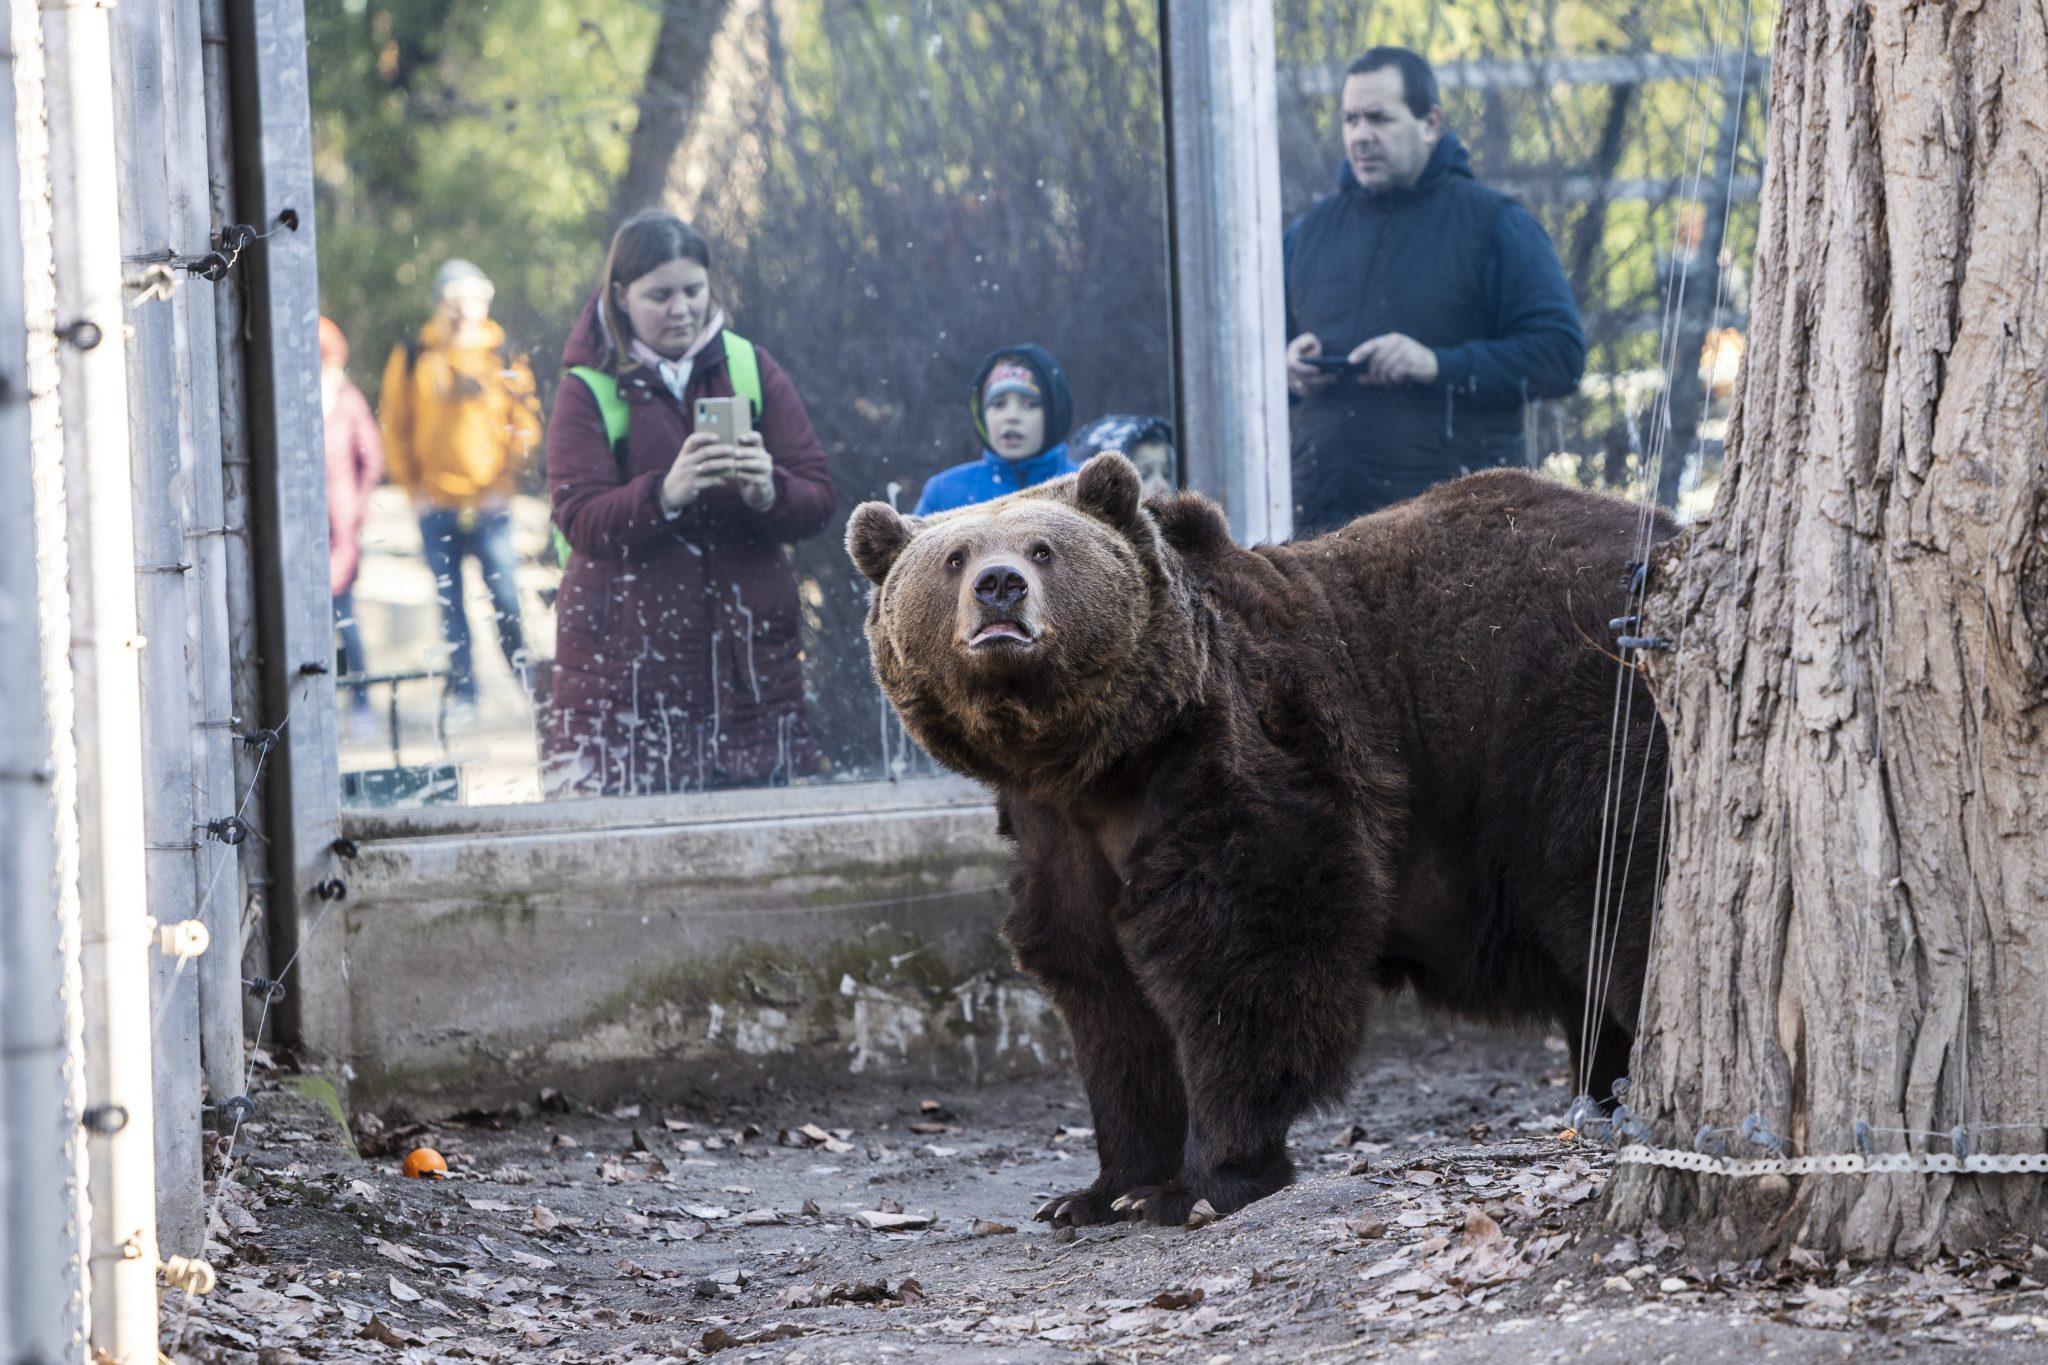 Bär des Budapester Zoos sagt langen Winter voraus post's picture